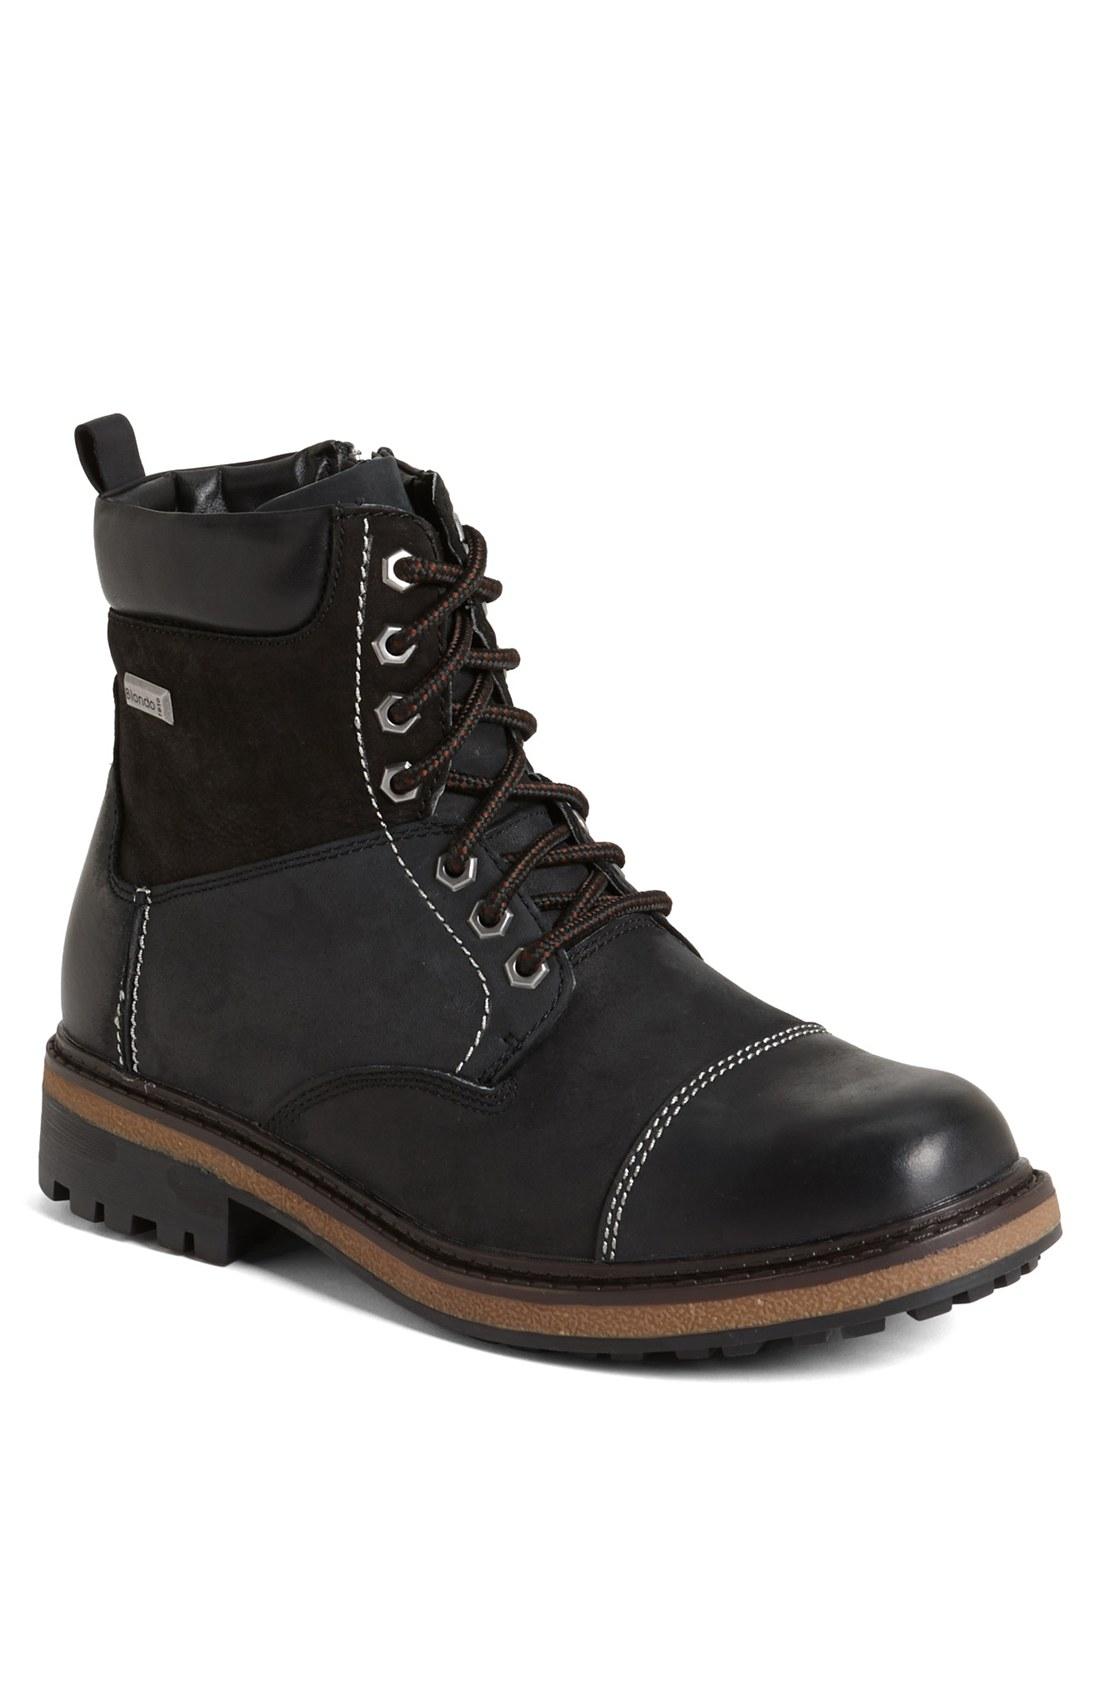 mens waterproof boots blondo u0027jarou0027 waterproof boot (men) | nordstrom ltpdxhi